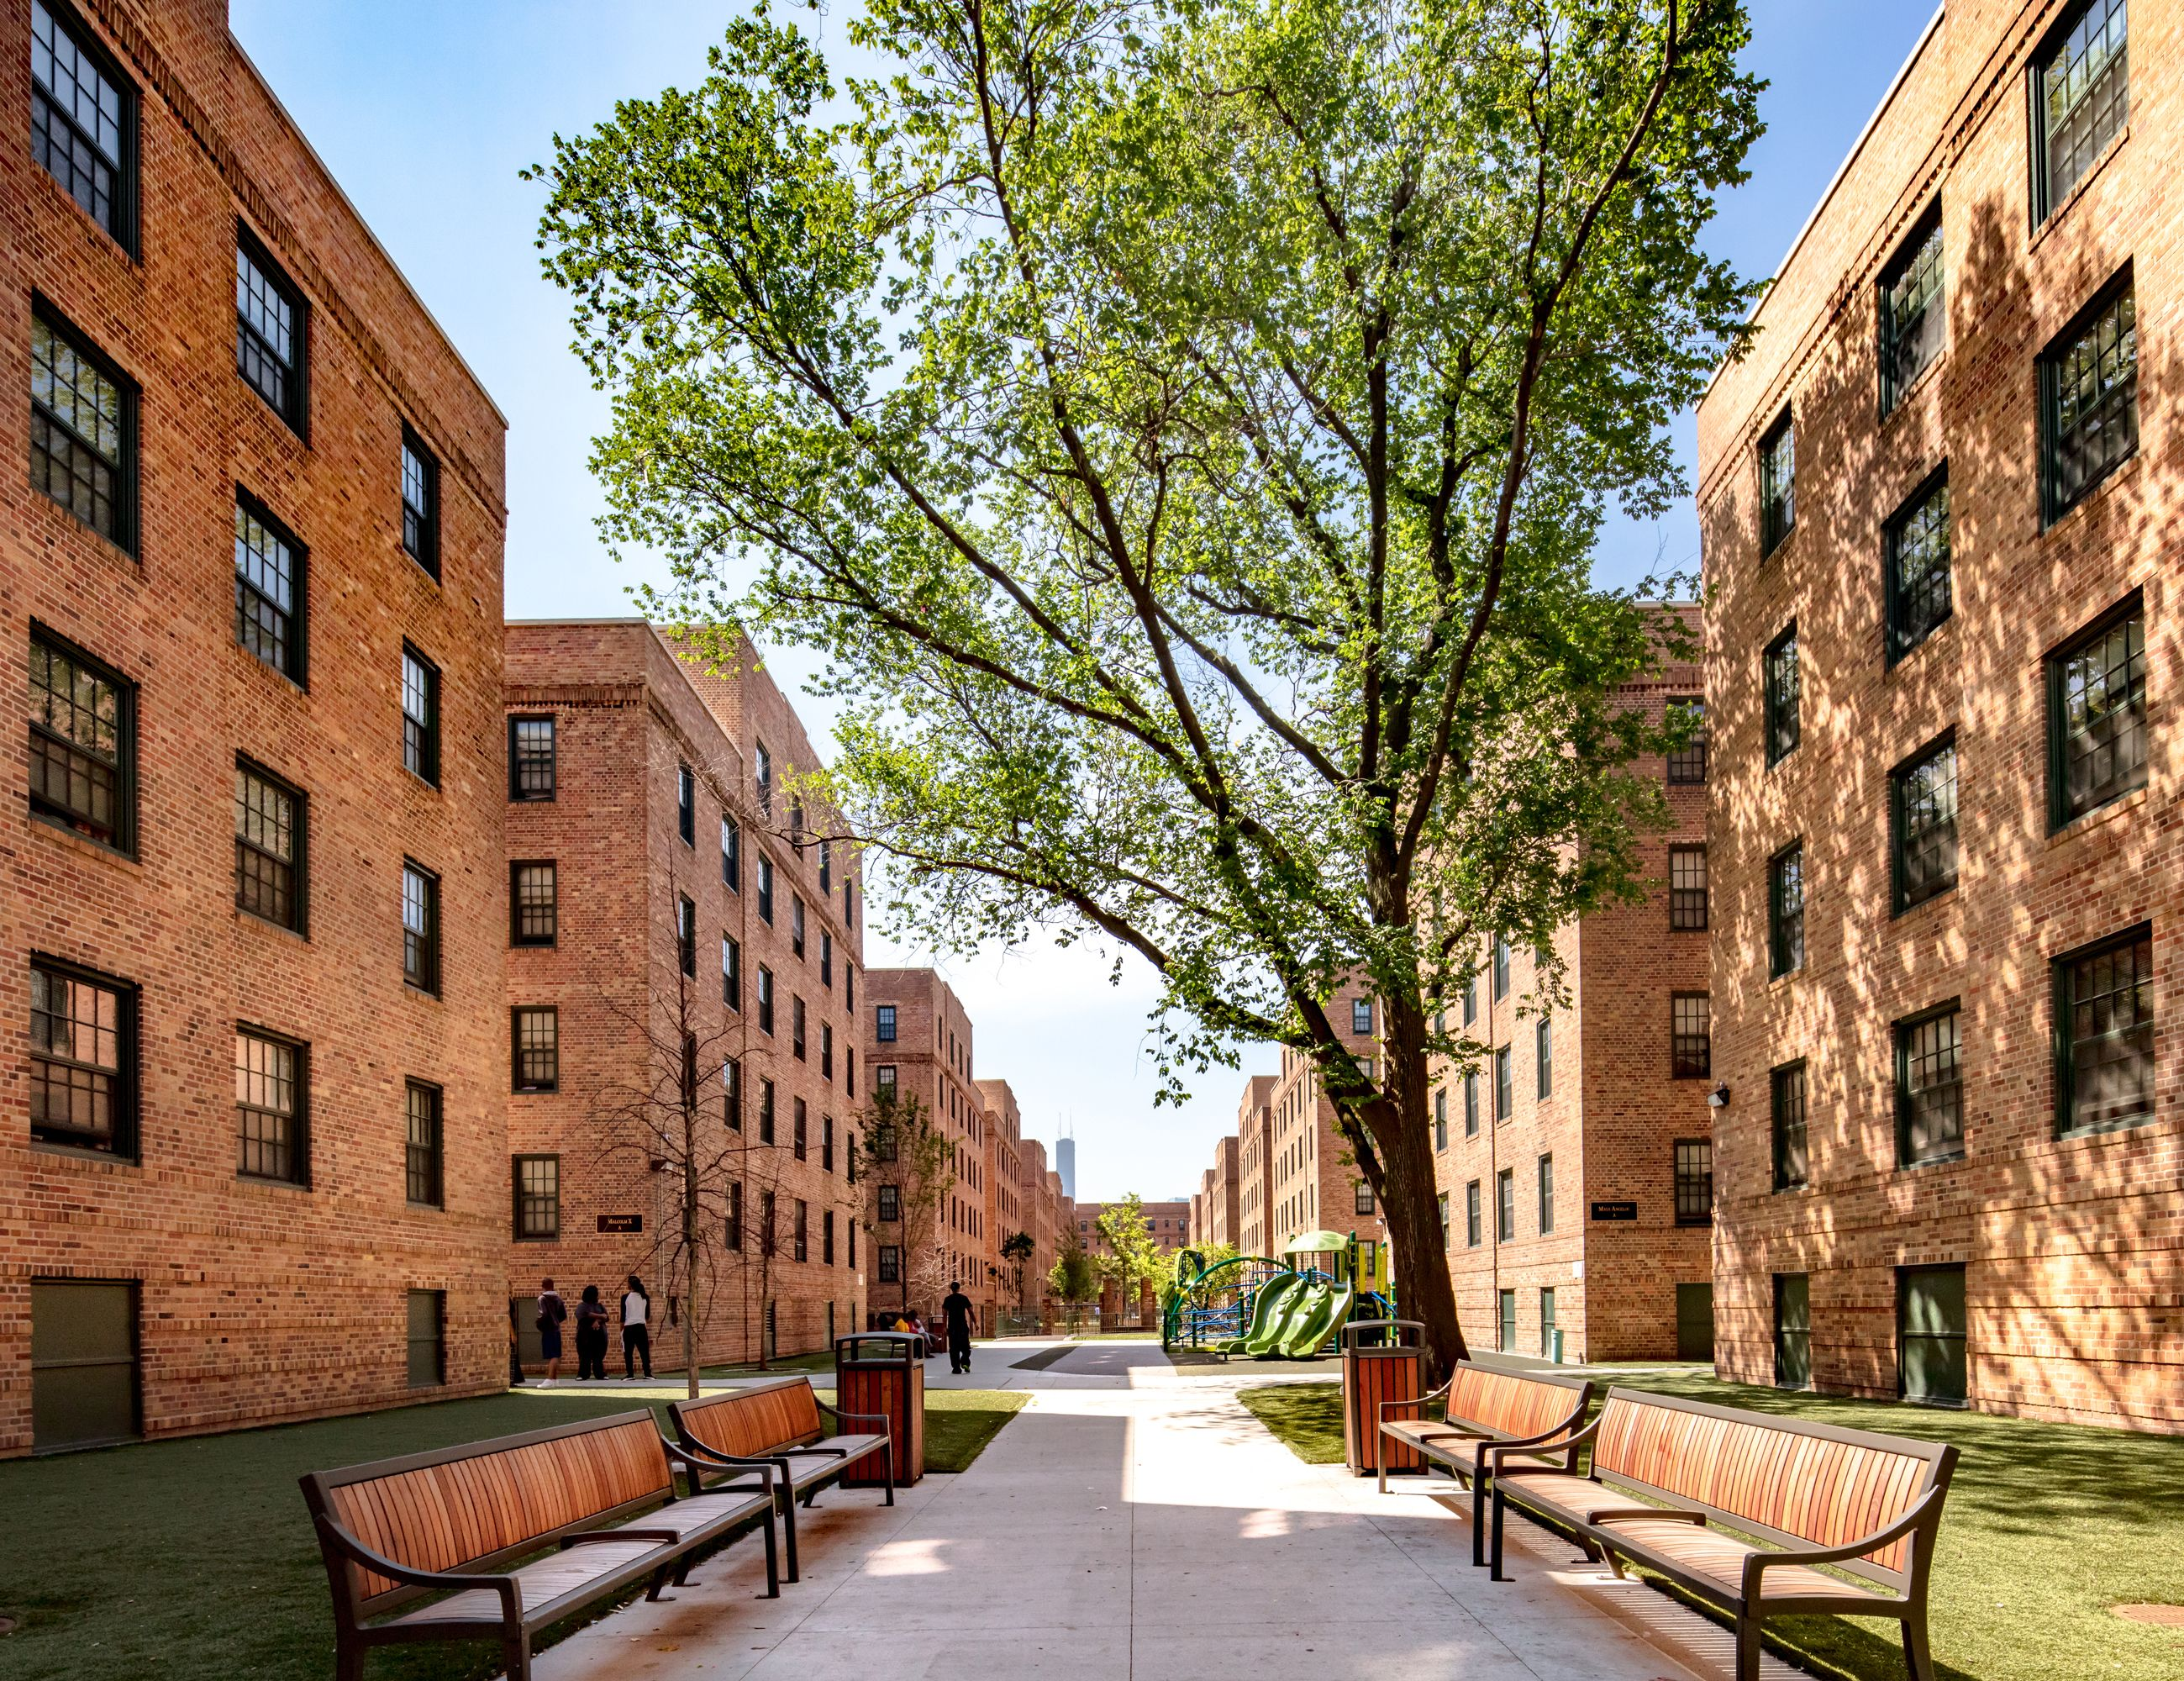 Marshall Field Apartments Courtyard Courtyard Apartments Apartment Garden Courtyard